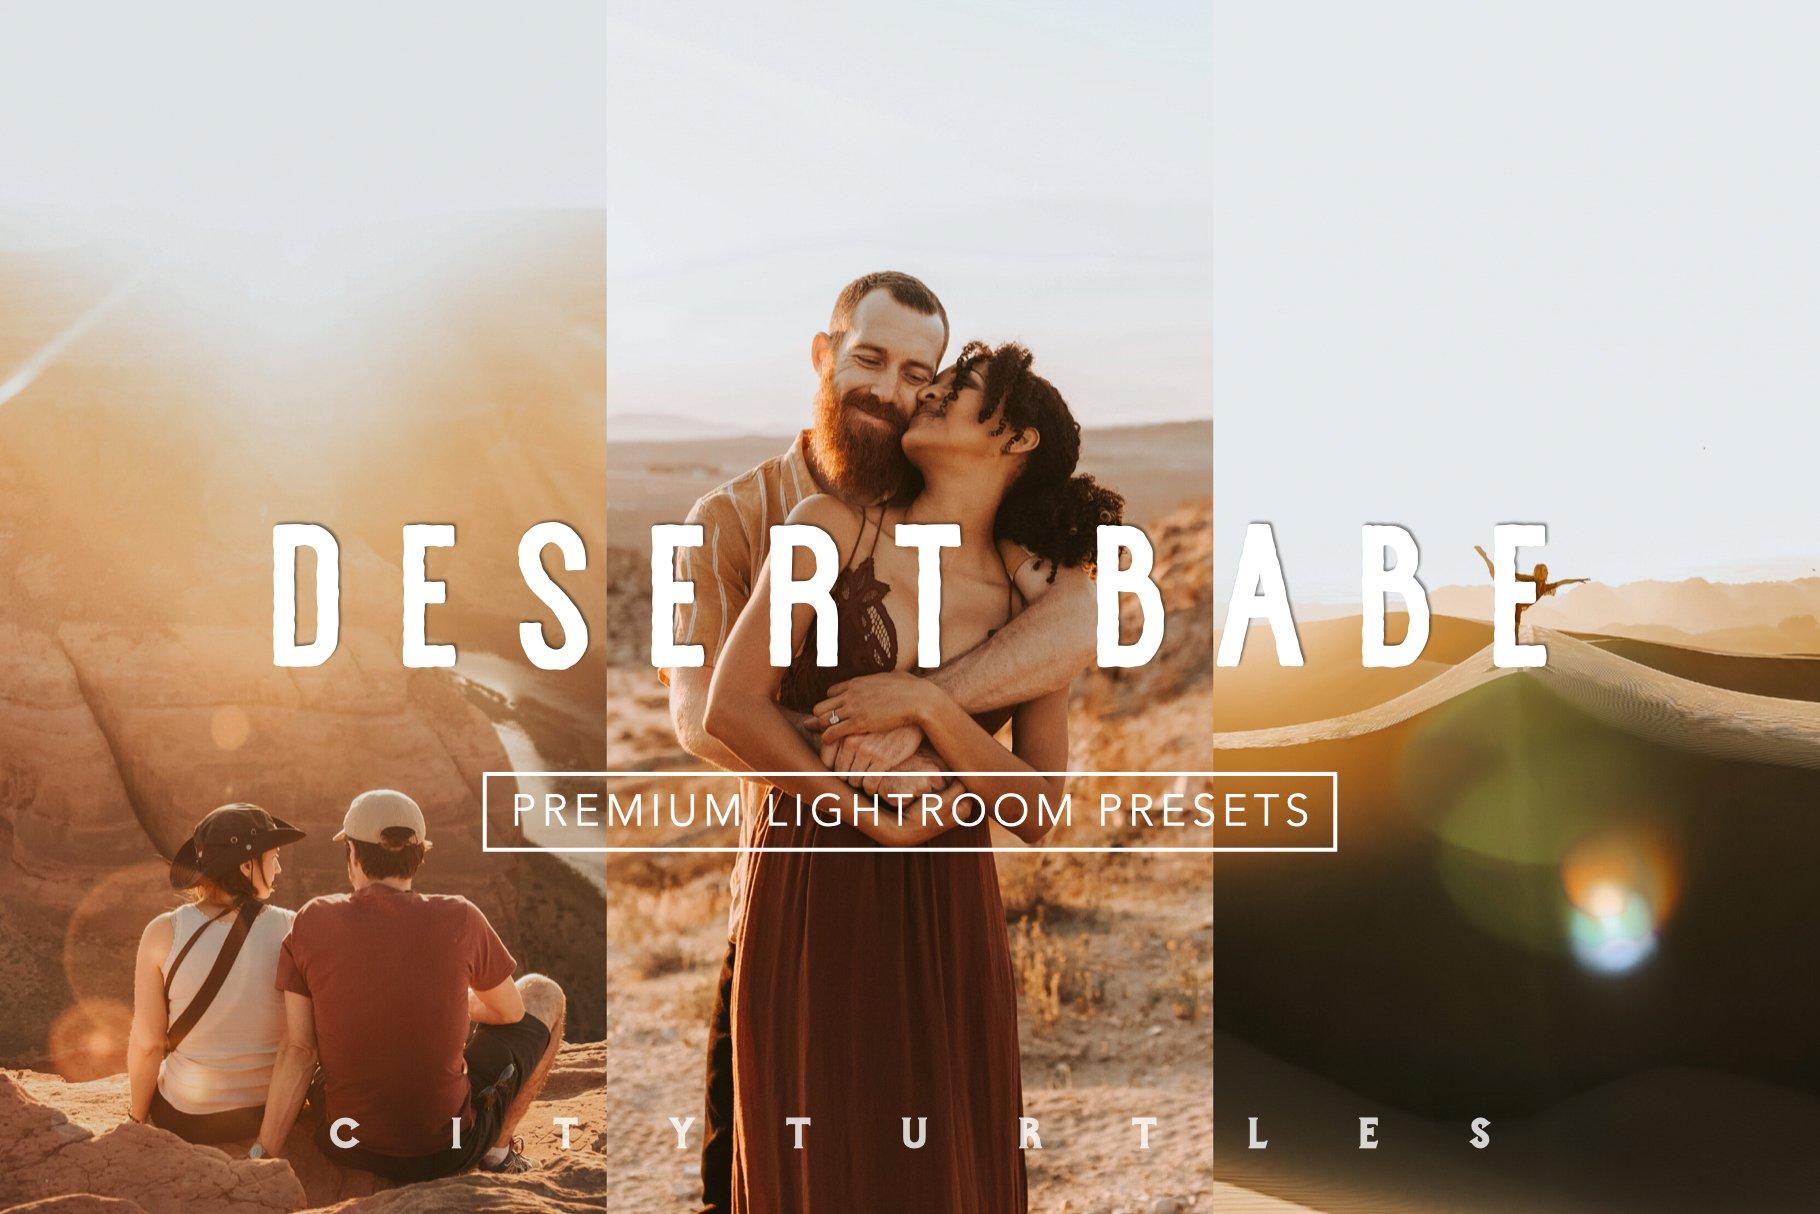 Warm Vibrant DESERT BABE LR Presets